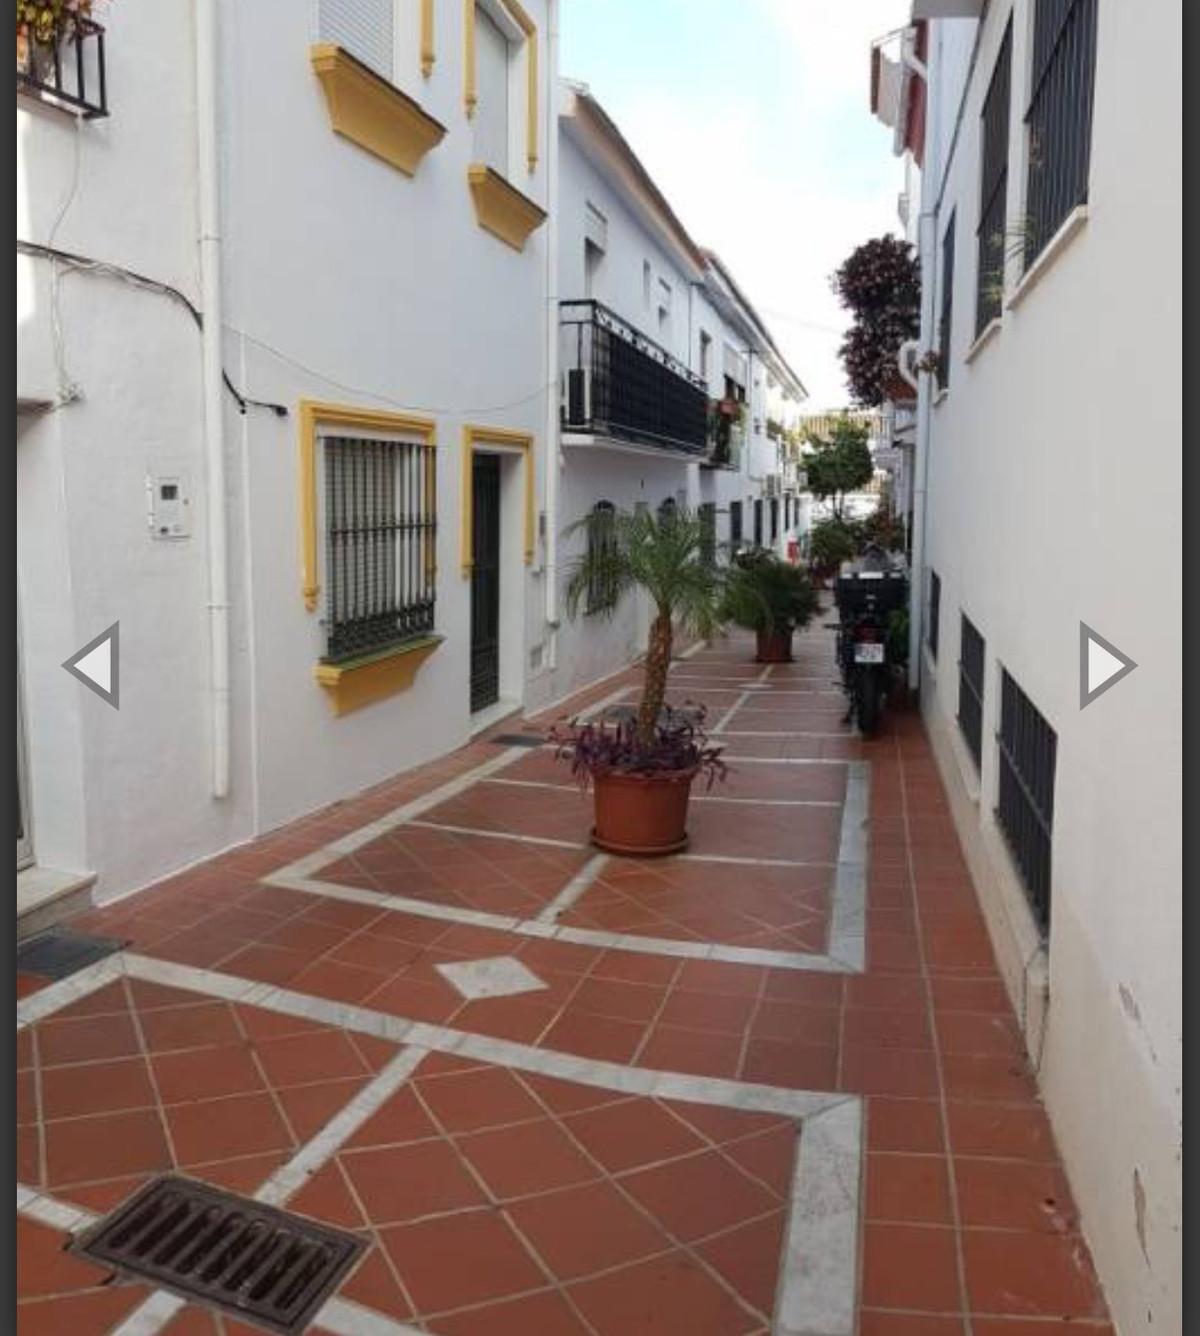 3 bedroom 1st floor apartment central Banalmadena Pueblo. Located in the very popular area close to ,Spain